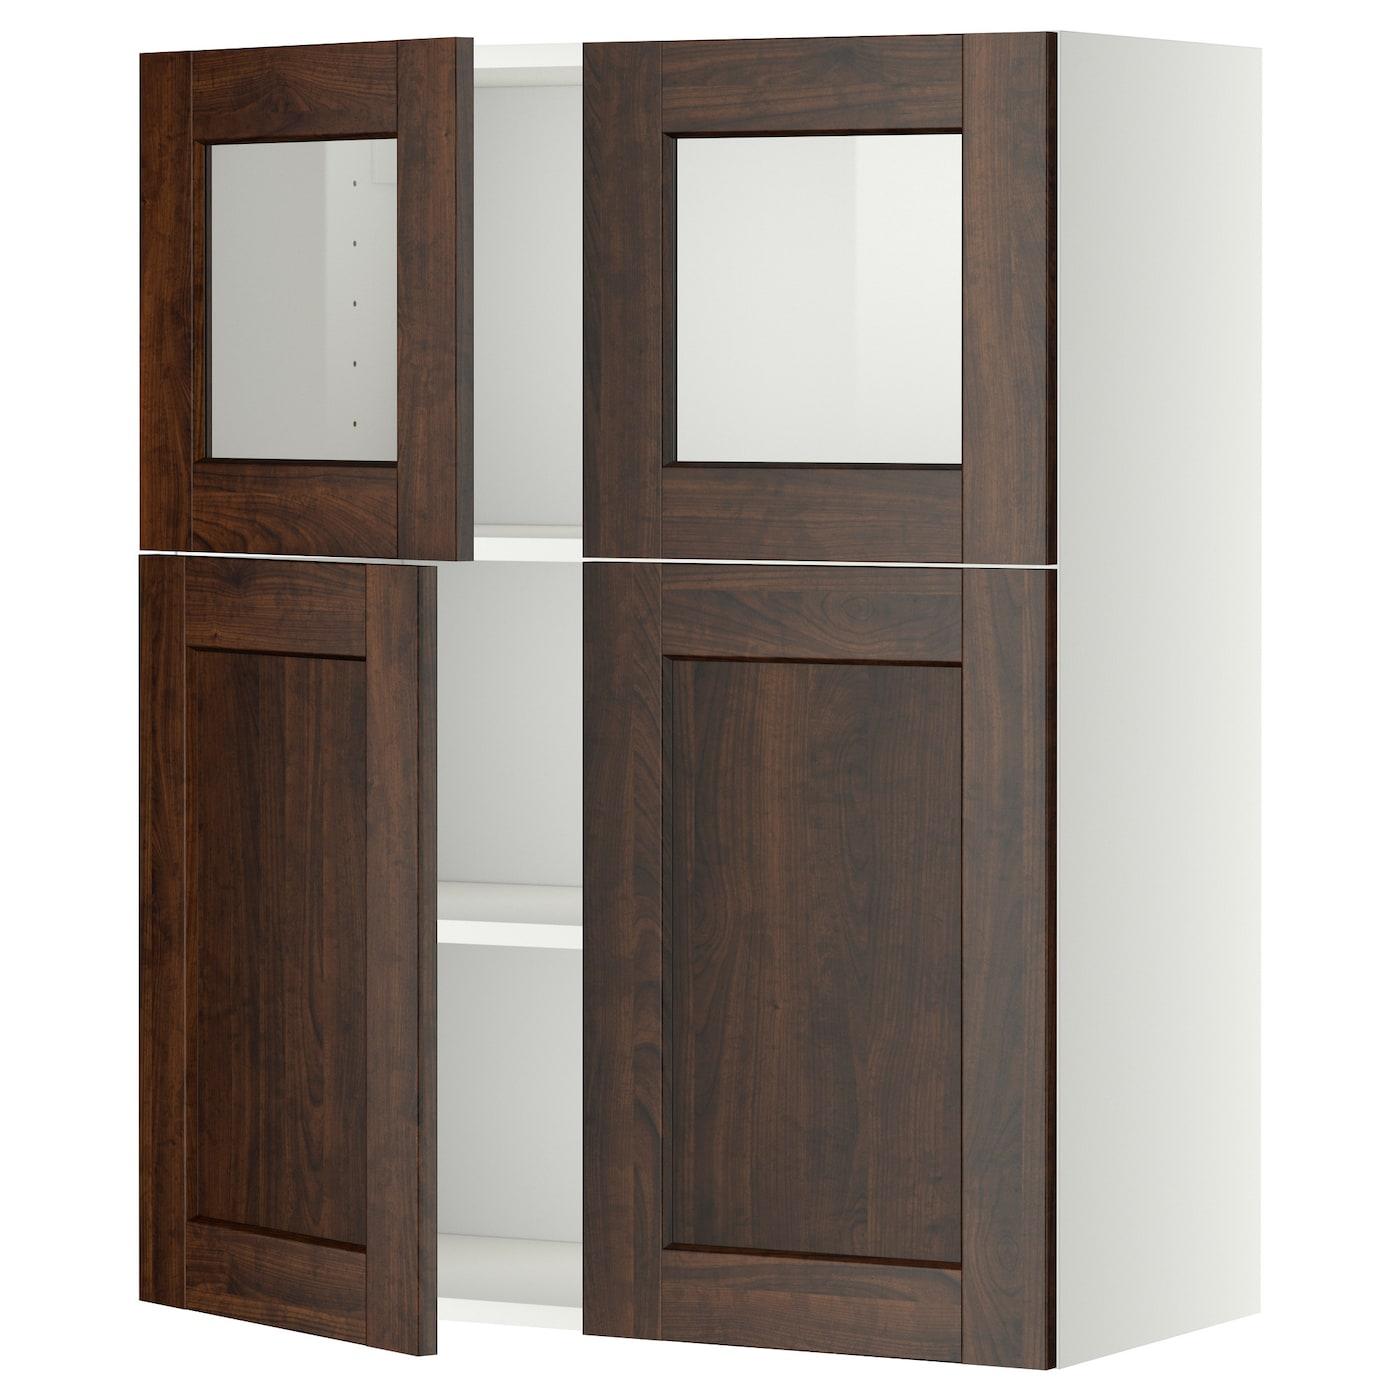 store californien ikea finest store venitien ikea aulnay. Black Bedroom Furniture Sets. Home Design Ideas